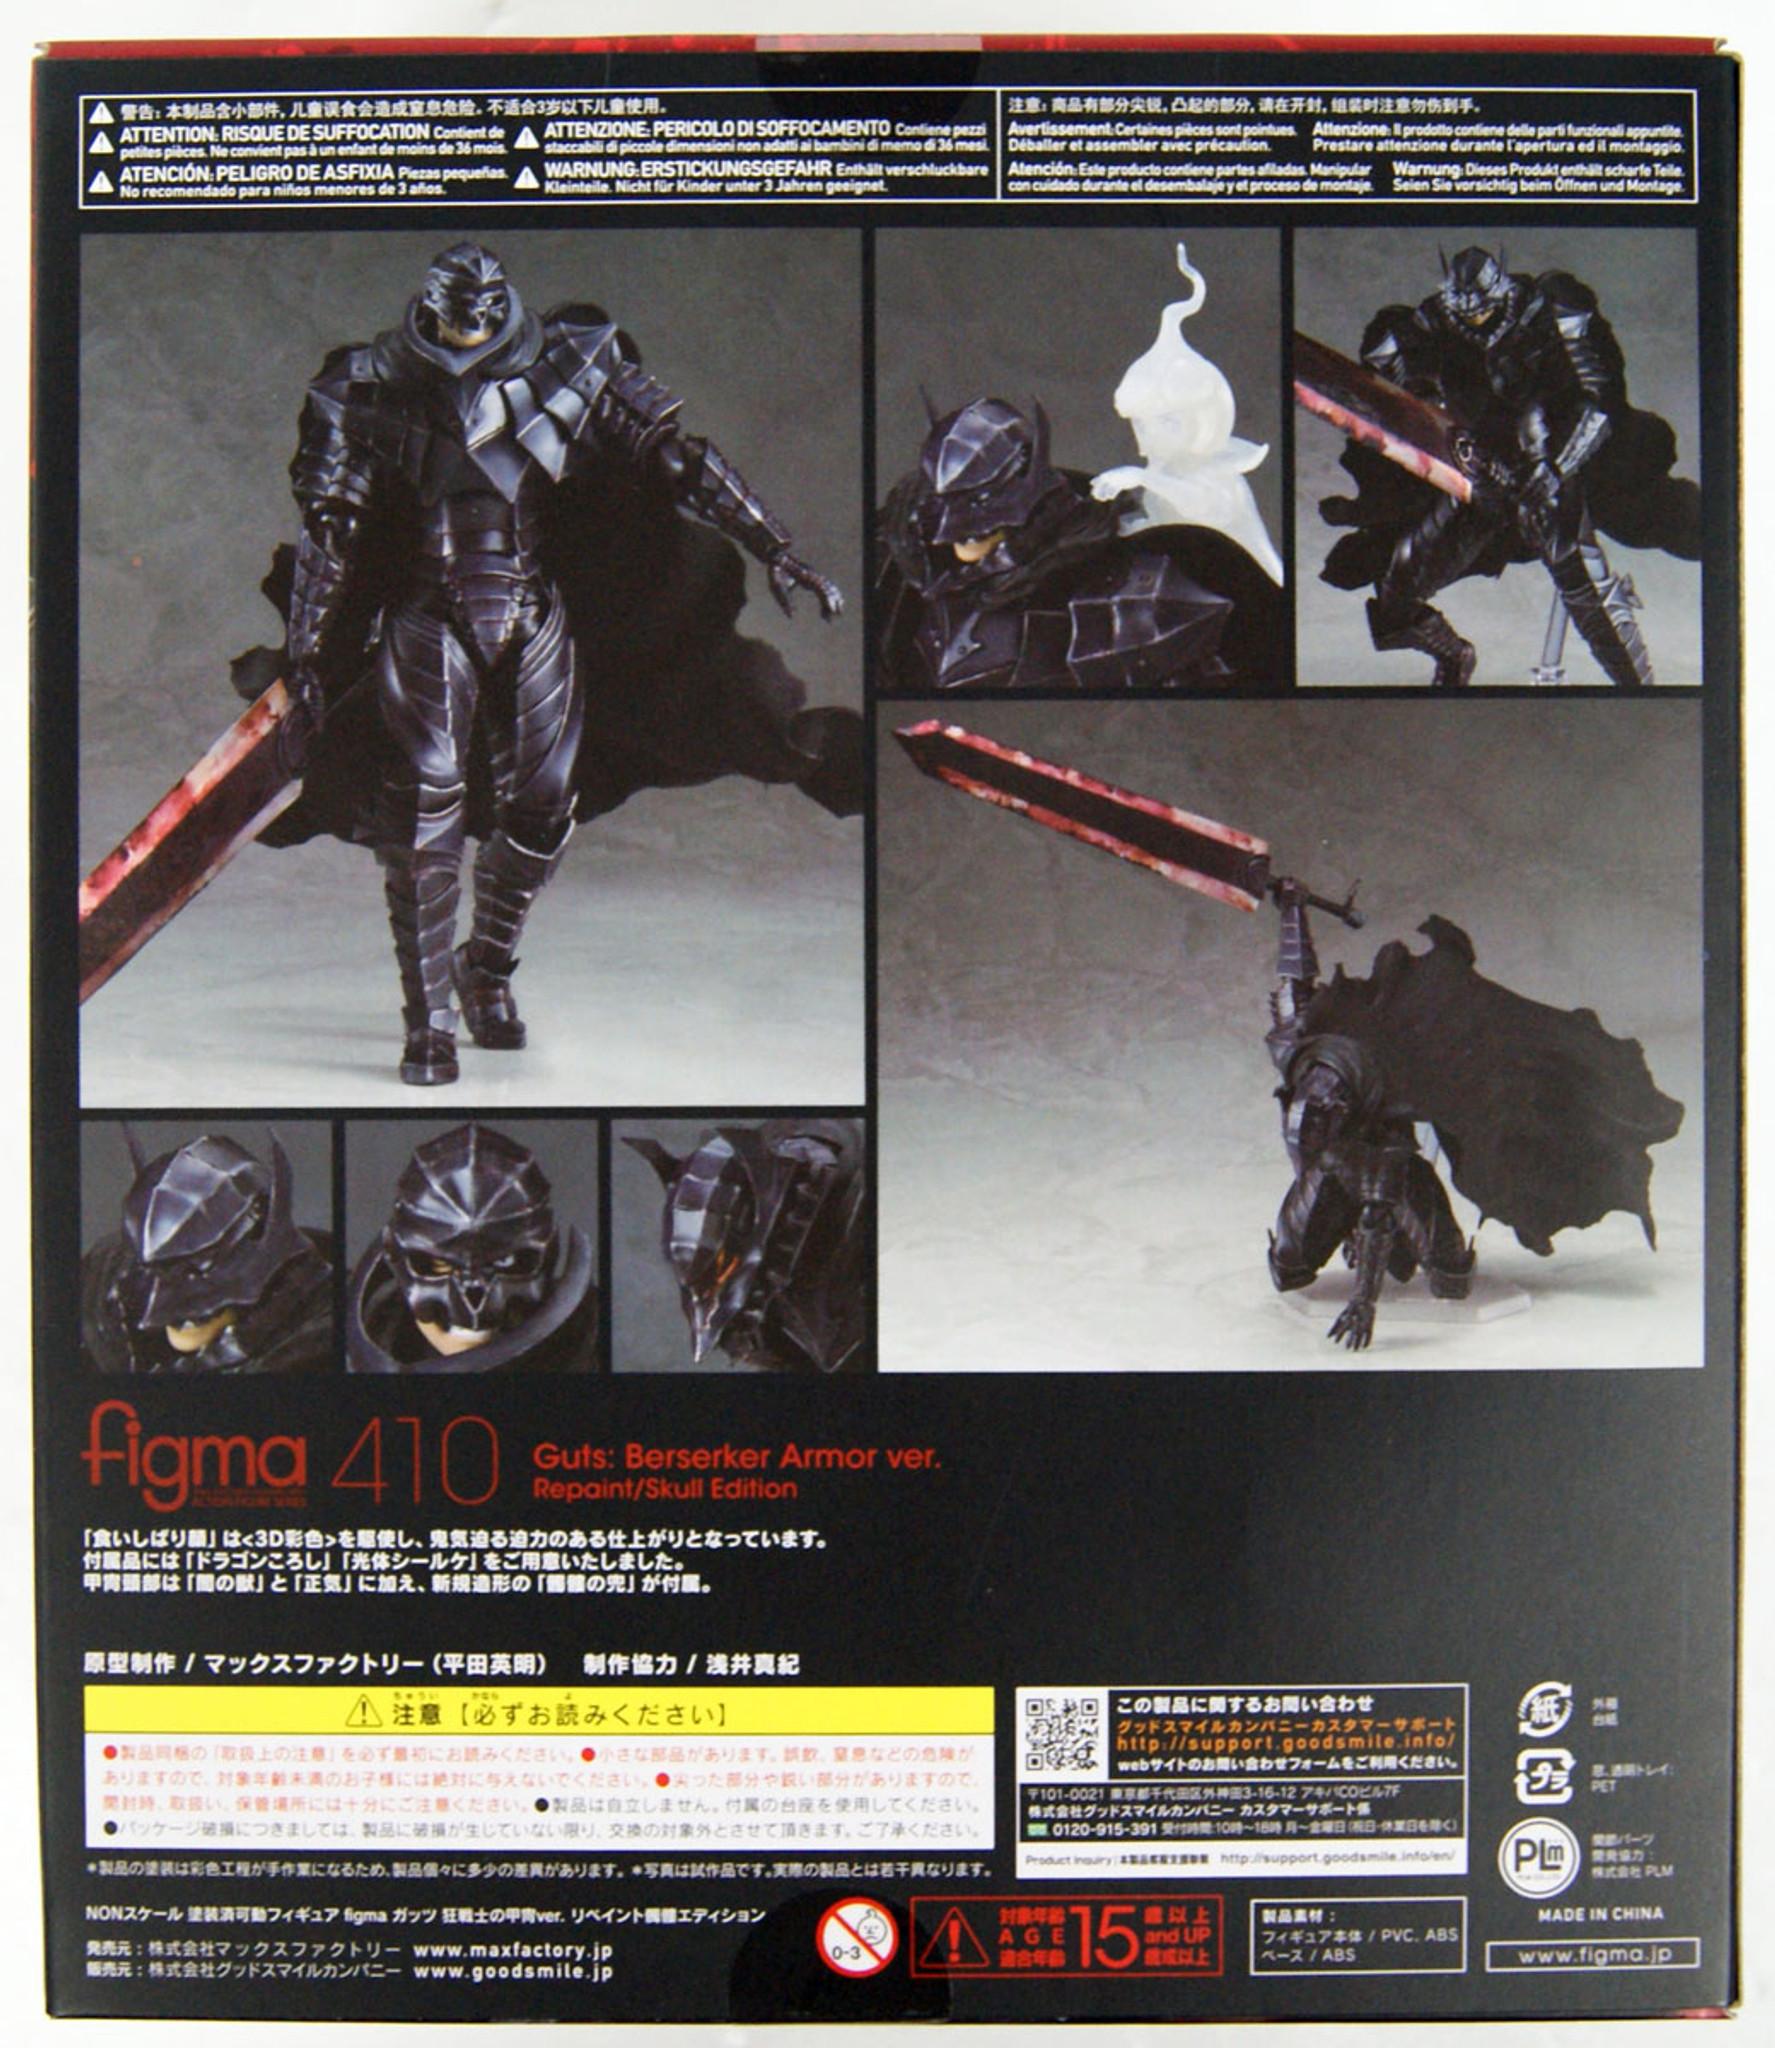 Max Factory figma 410 Guts: Berserker Armor ver  Repaint / Skull Edition  (Berserk)